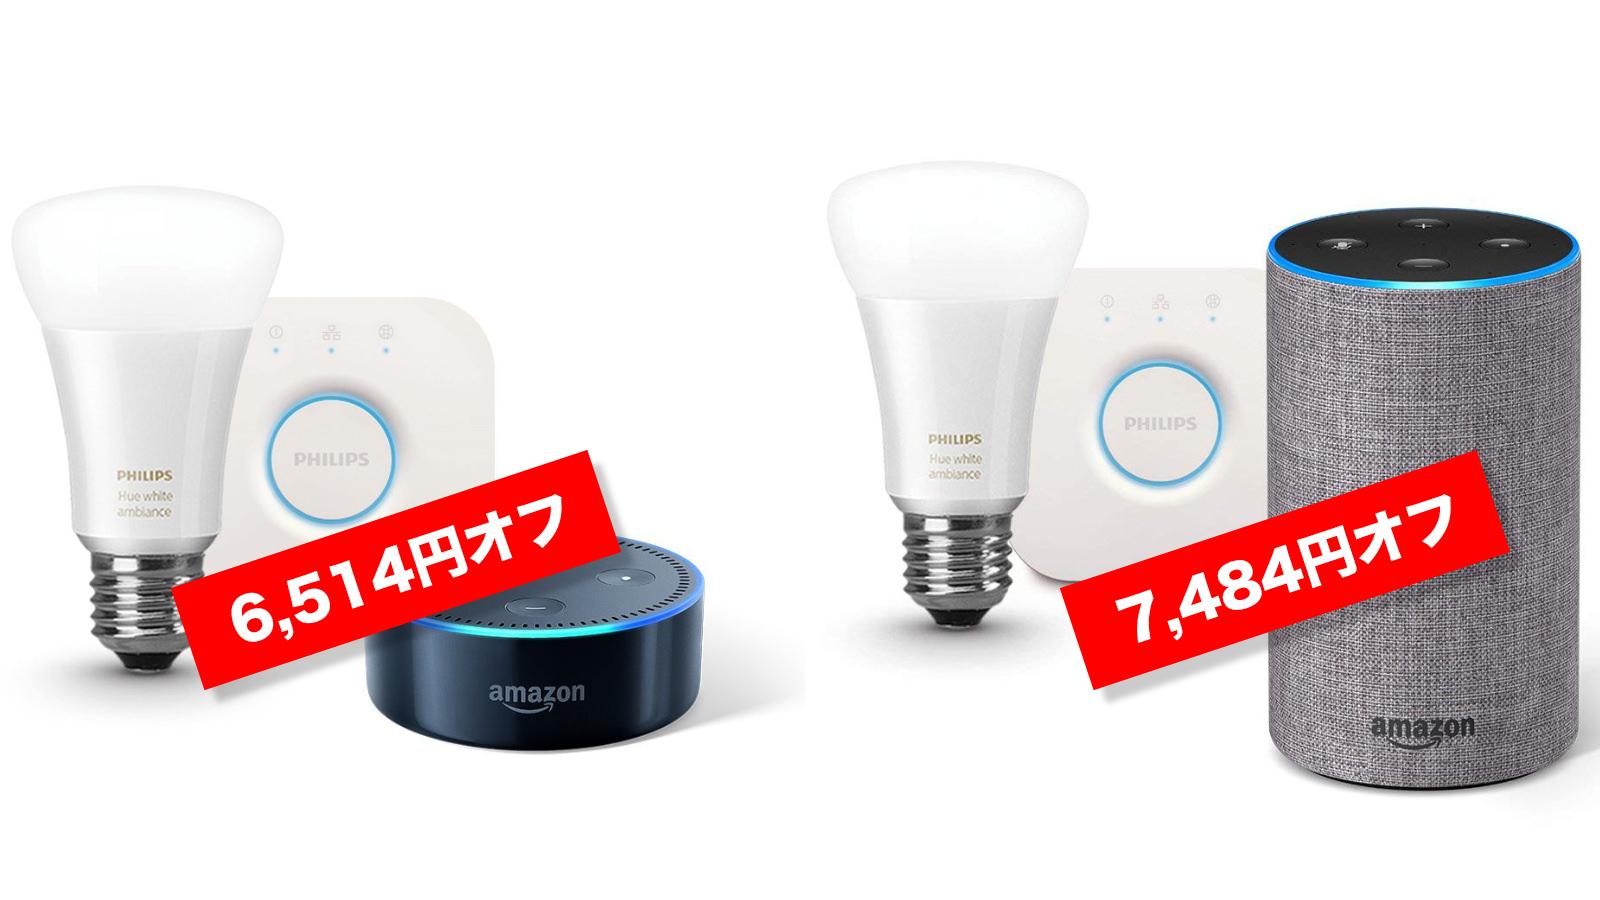 Philips-Hue-and-Echo-Set-sale.jpg